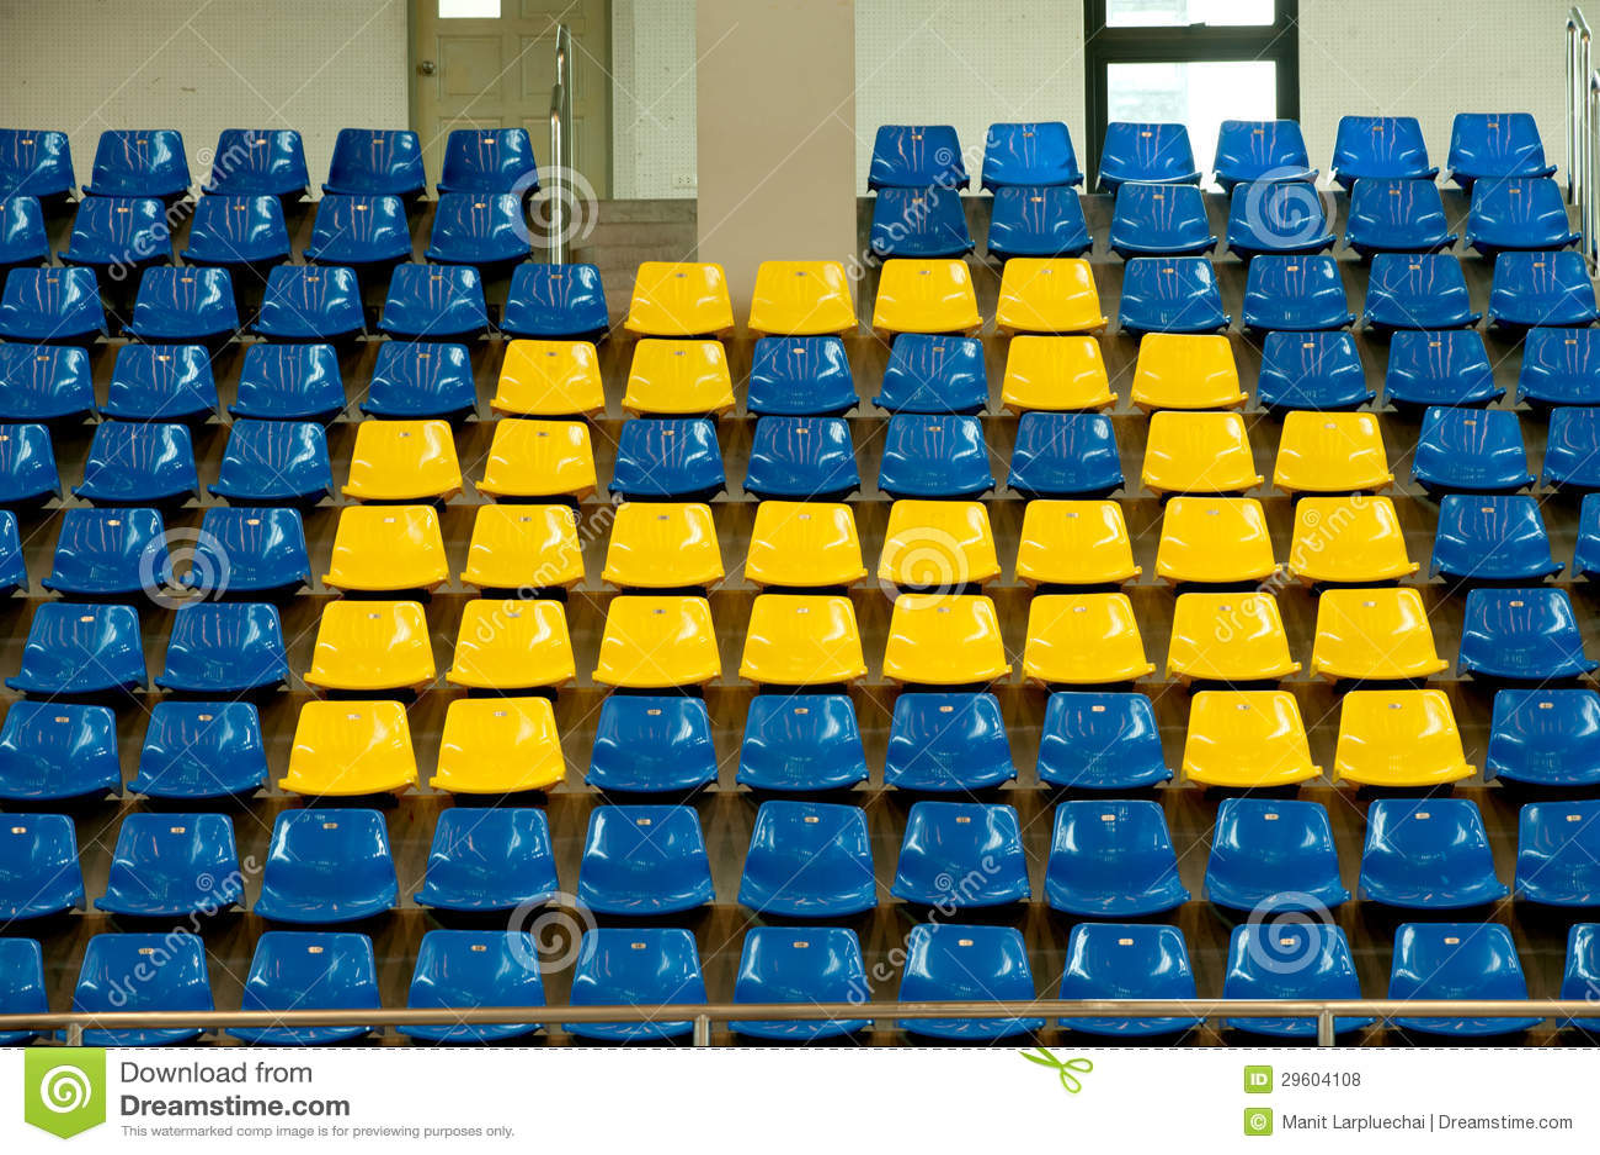 Seats In Basketball Stadium Stock Photo Image Of Empty